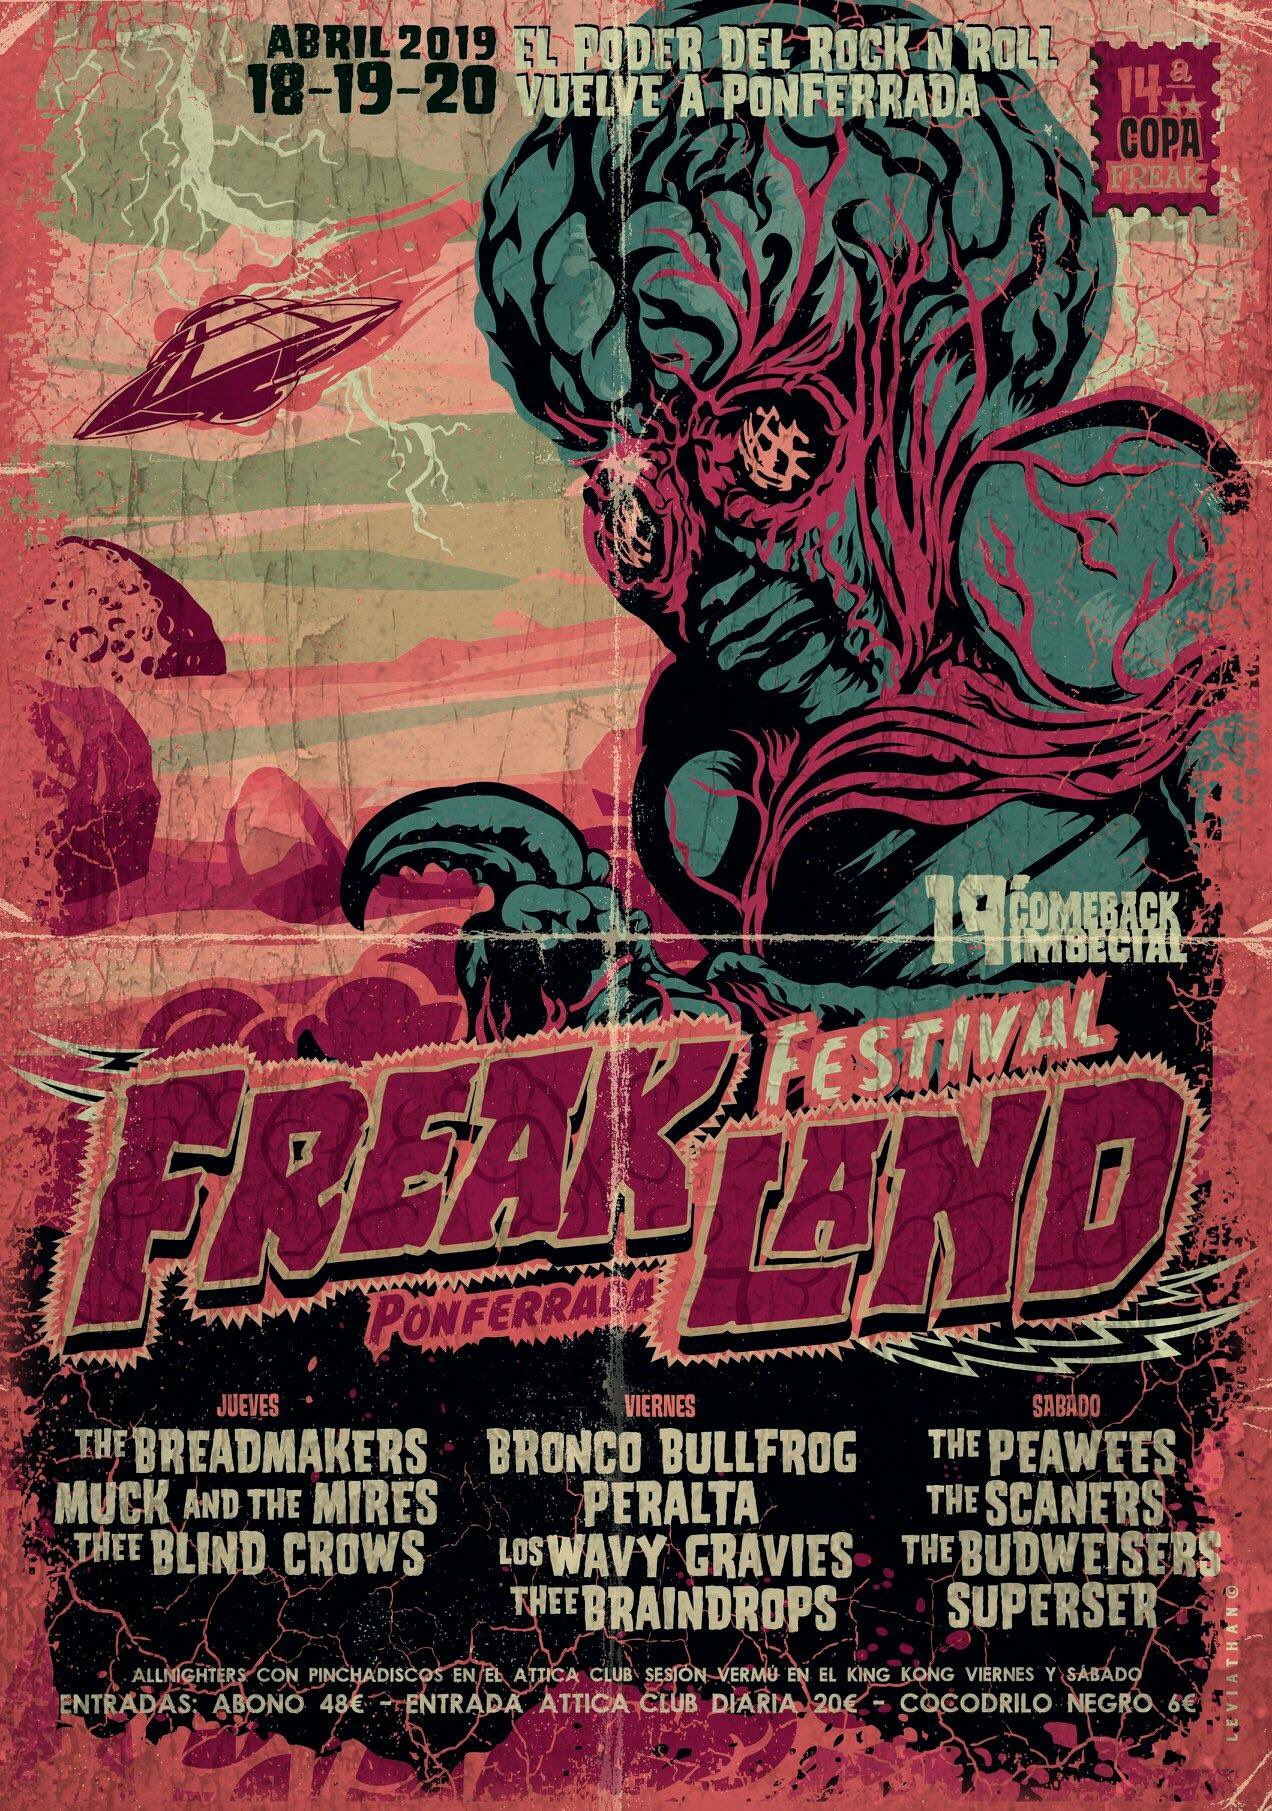 Freakland Festival  DwOS4-7XcAAJR_I